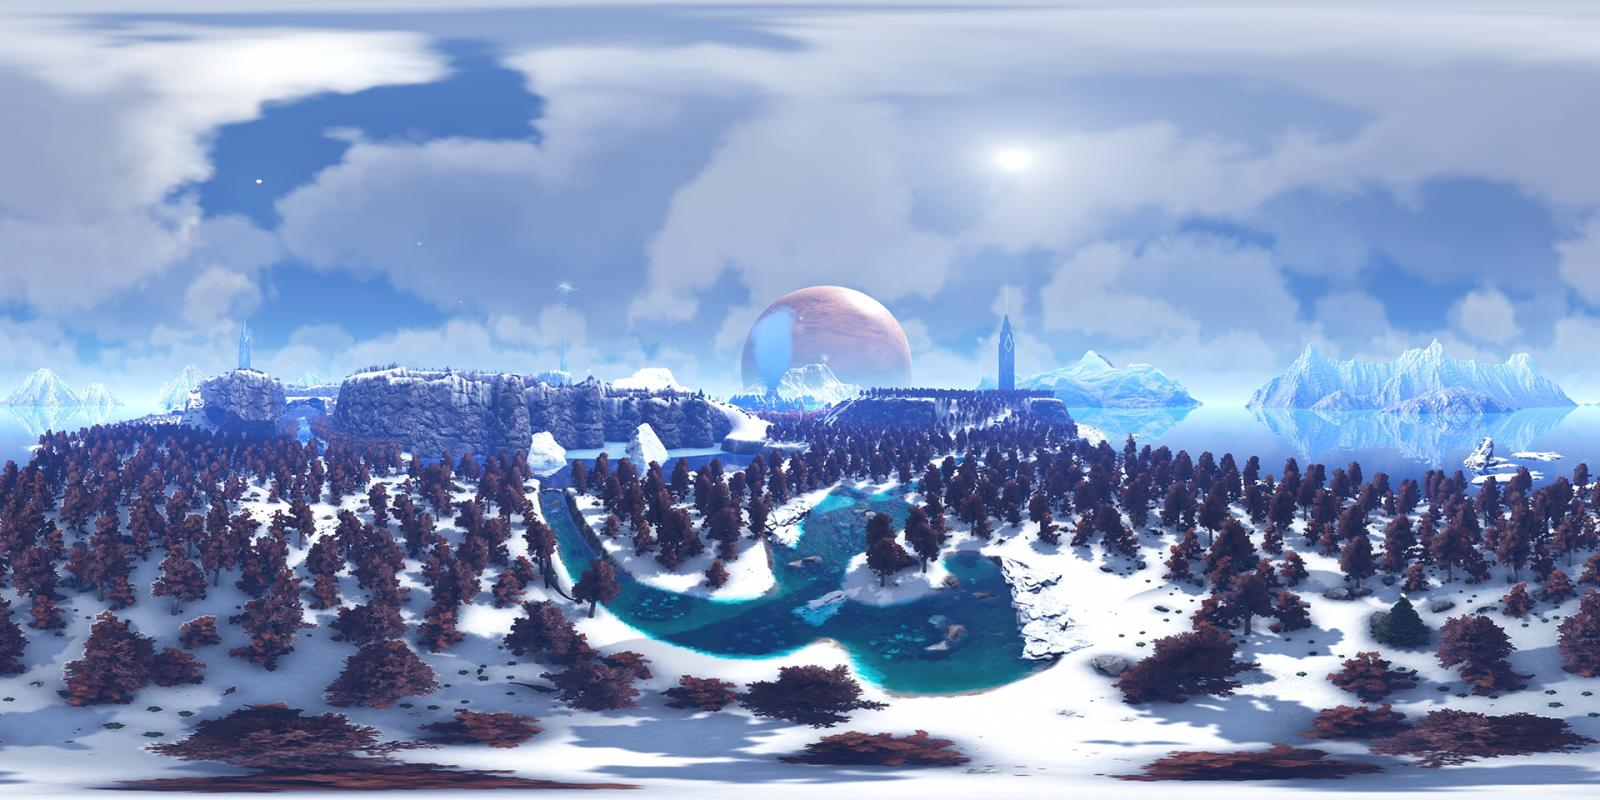 large.5870813821351_EXFIB0-WinterWonderland-360Stereo.jpg